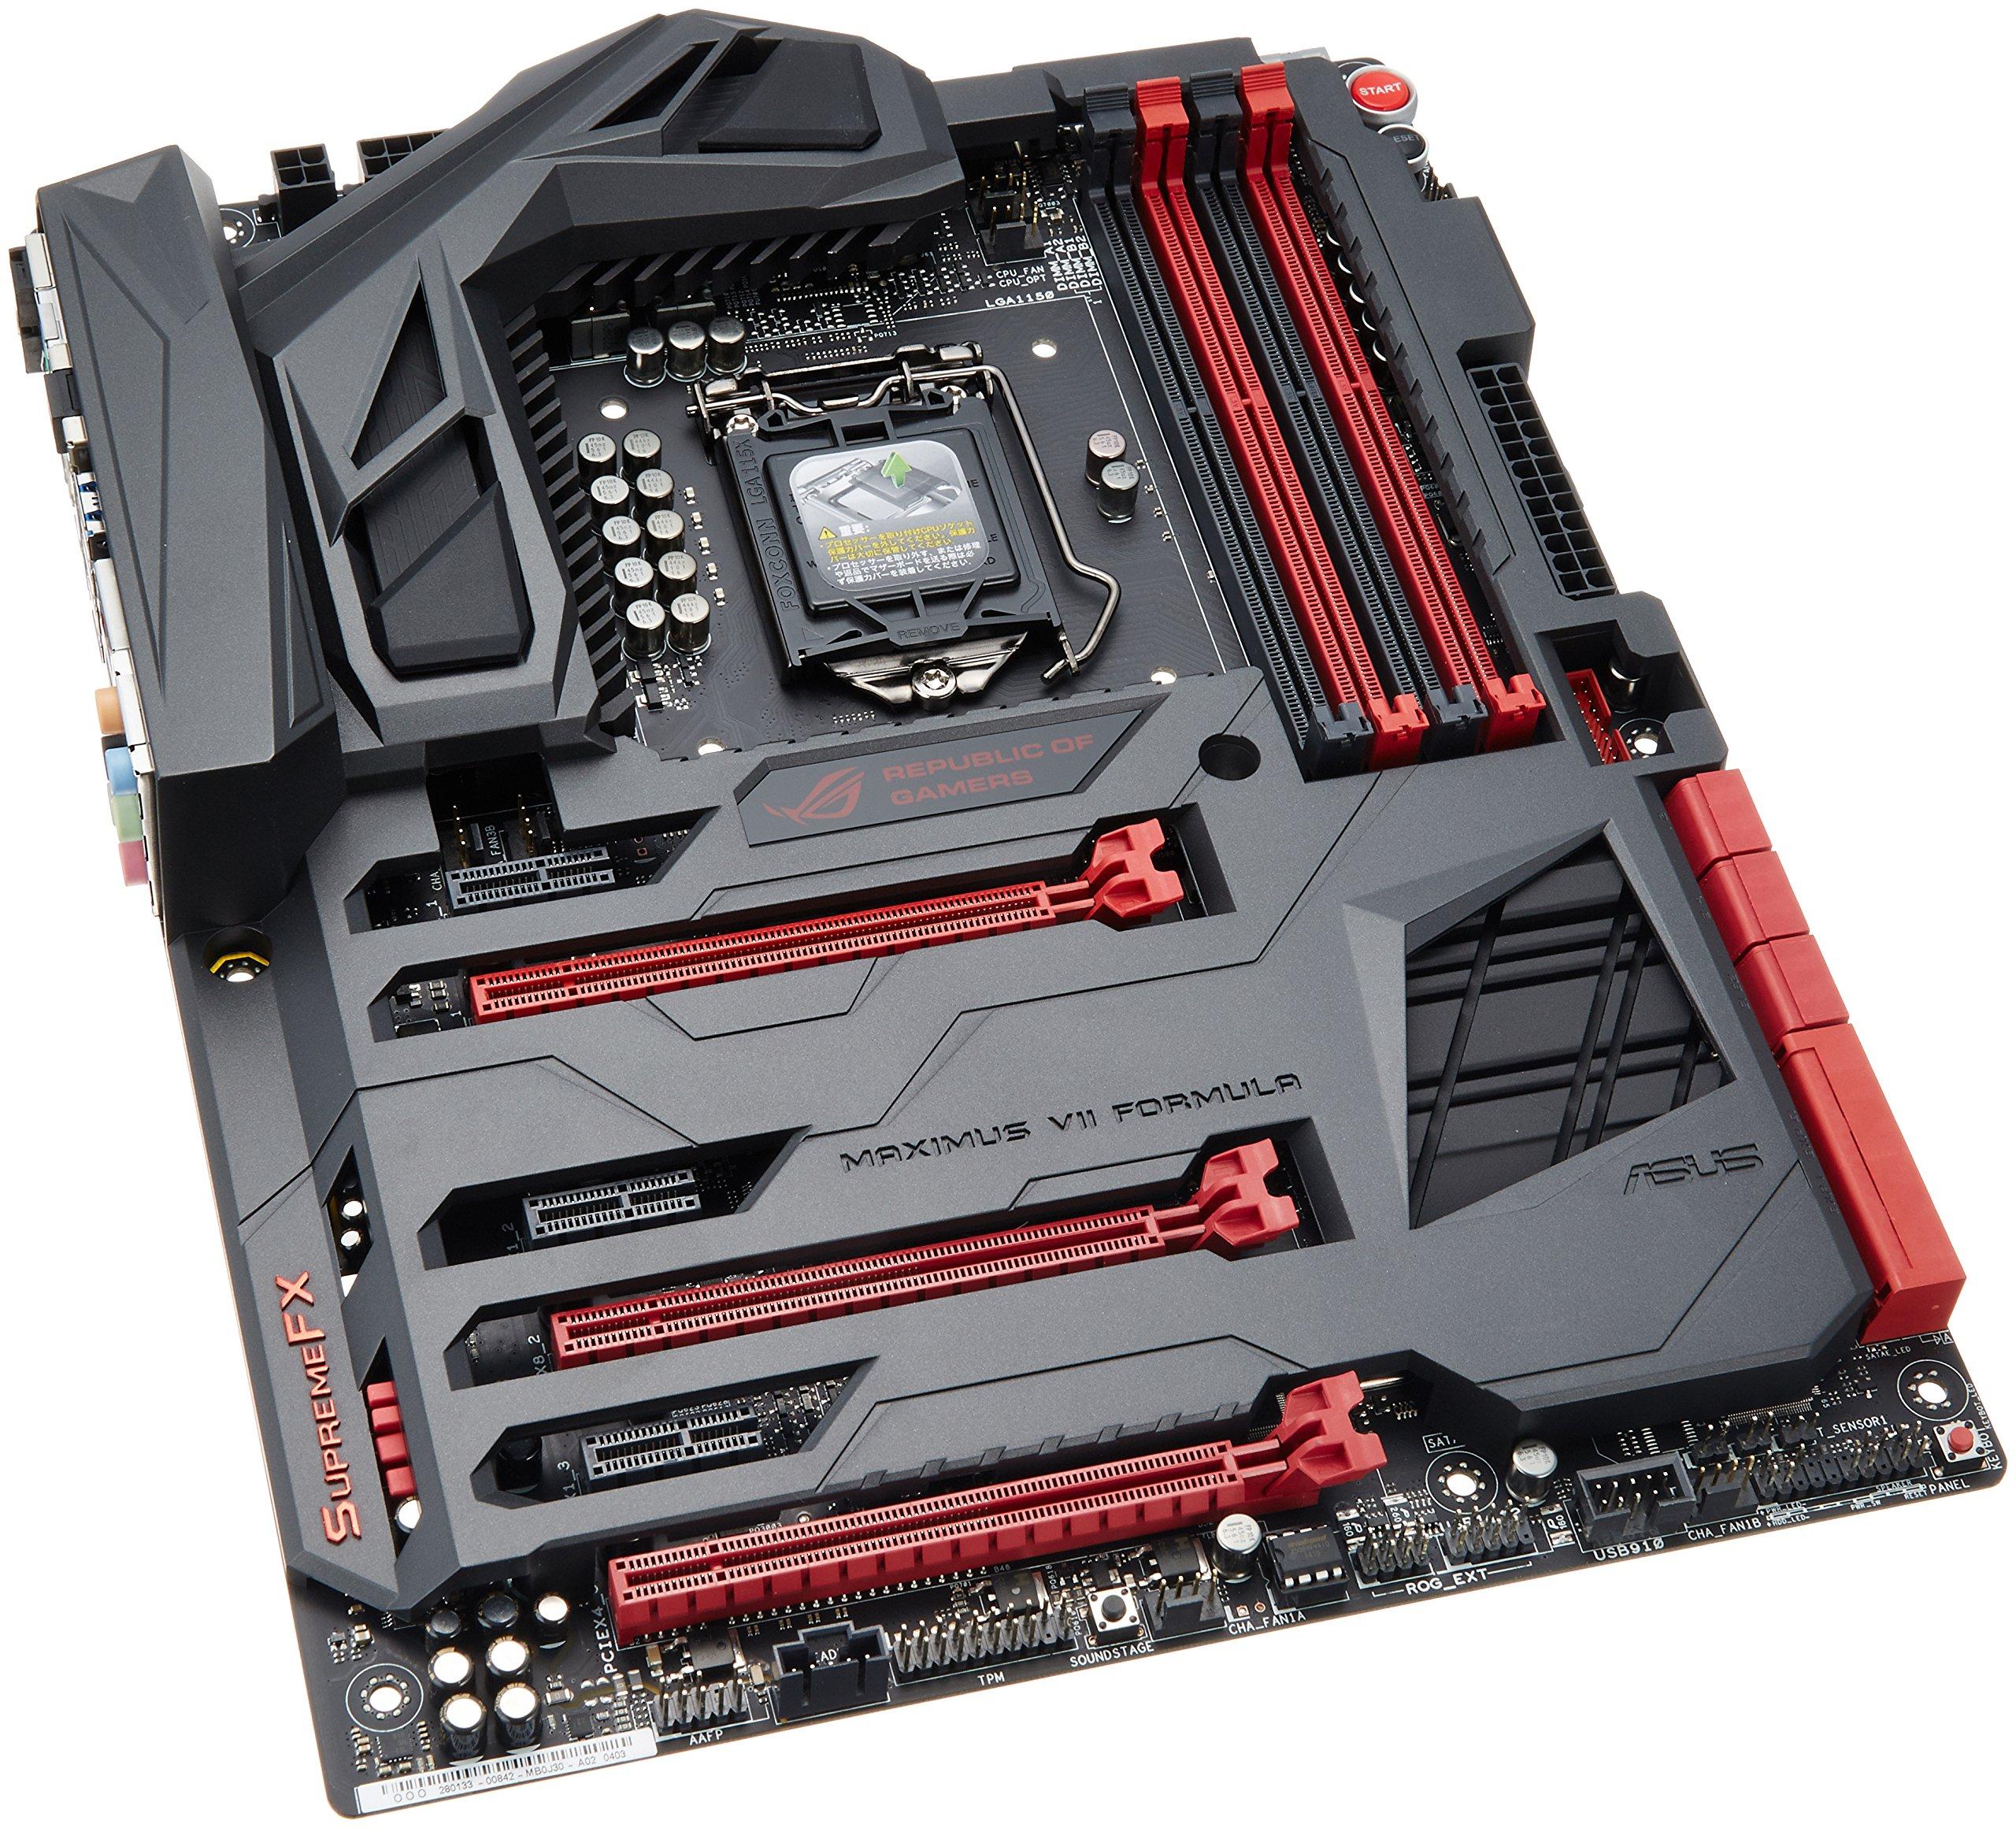 ASUS エイスース マザーボード Intel Z97チップセット LGA1150ソケット ゲーミングマザーボード MAXIMUS VII FORMULA【ATX】